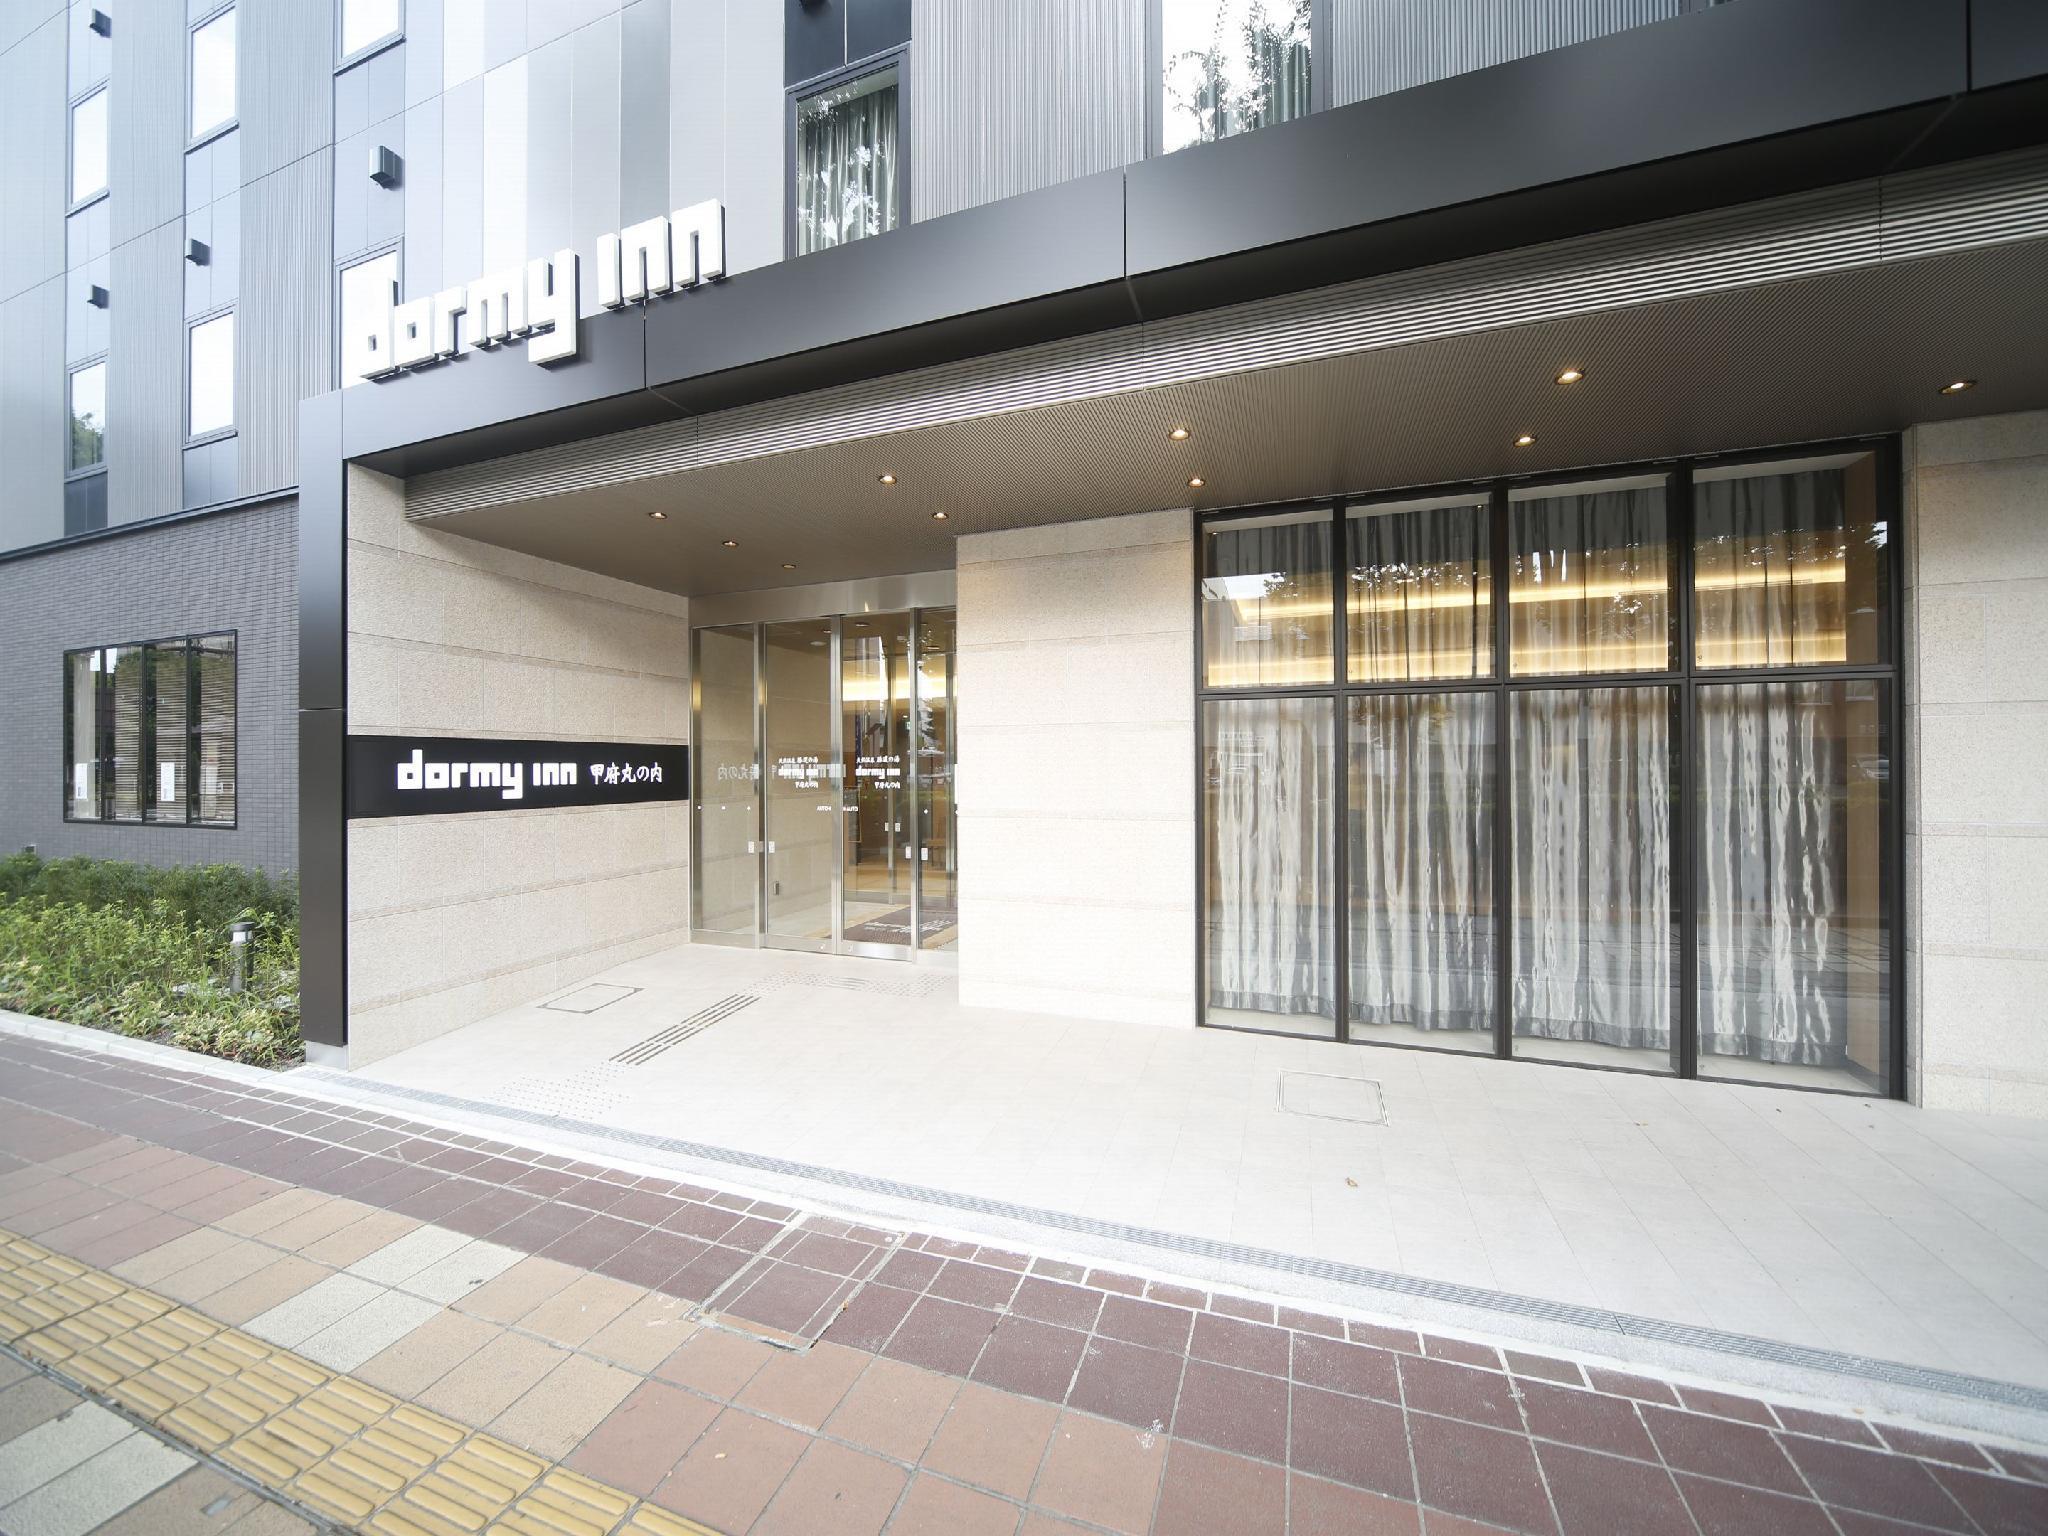 Dormy Inn Kofu Marunouchi Hot Springs